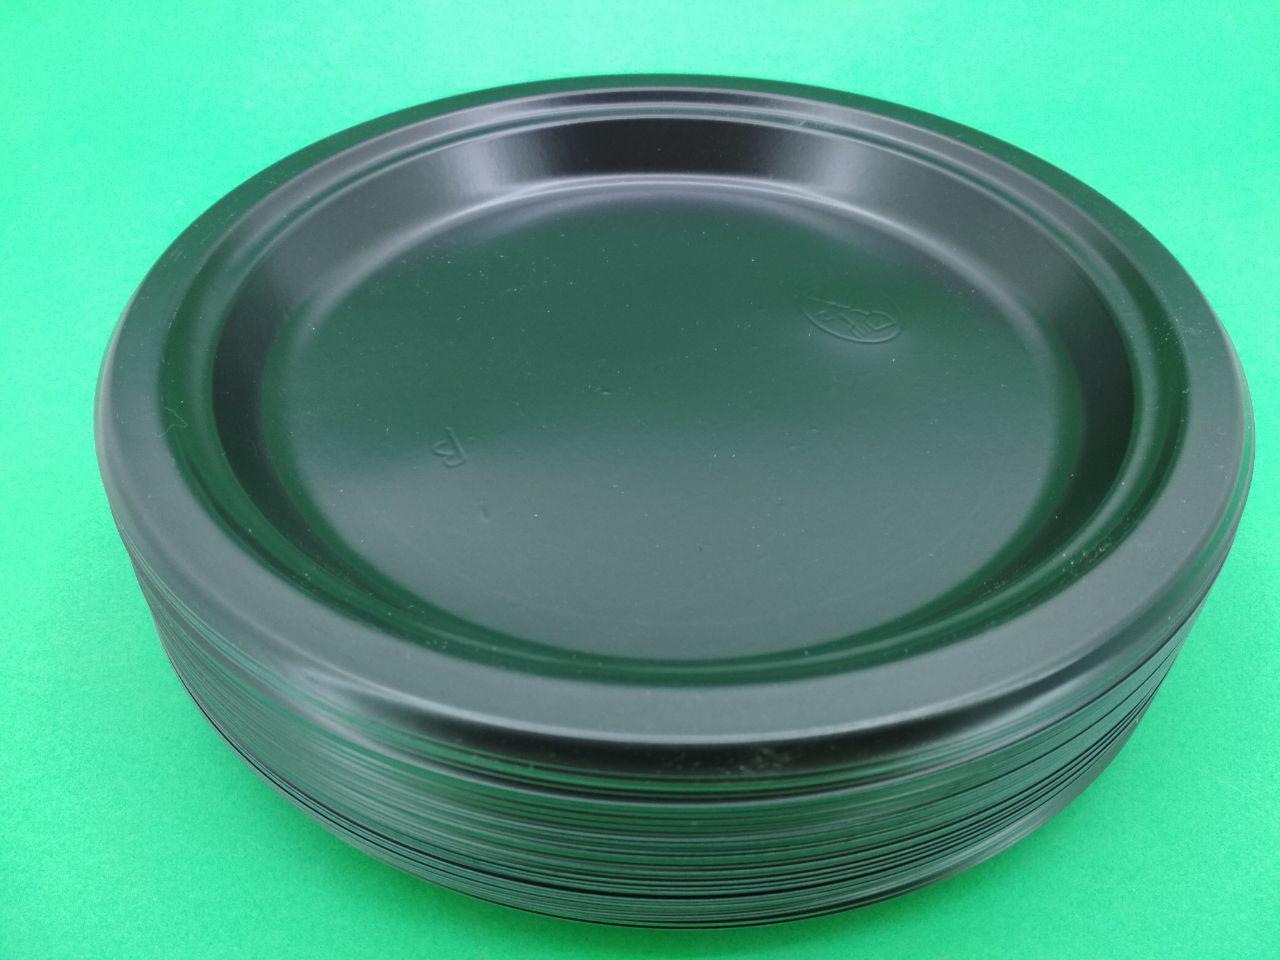 Тарелка одноразовая пластиковая 260 mm Черная (50 шт)